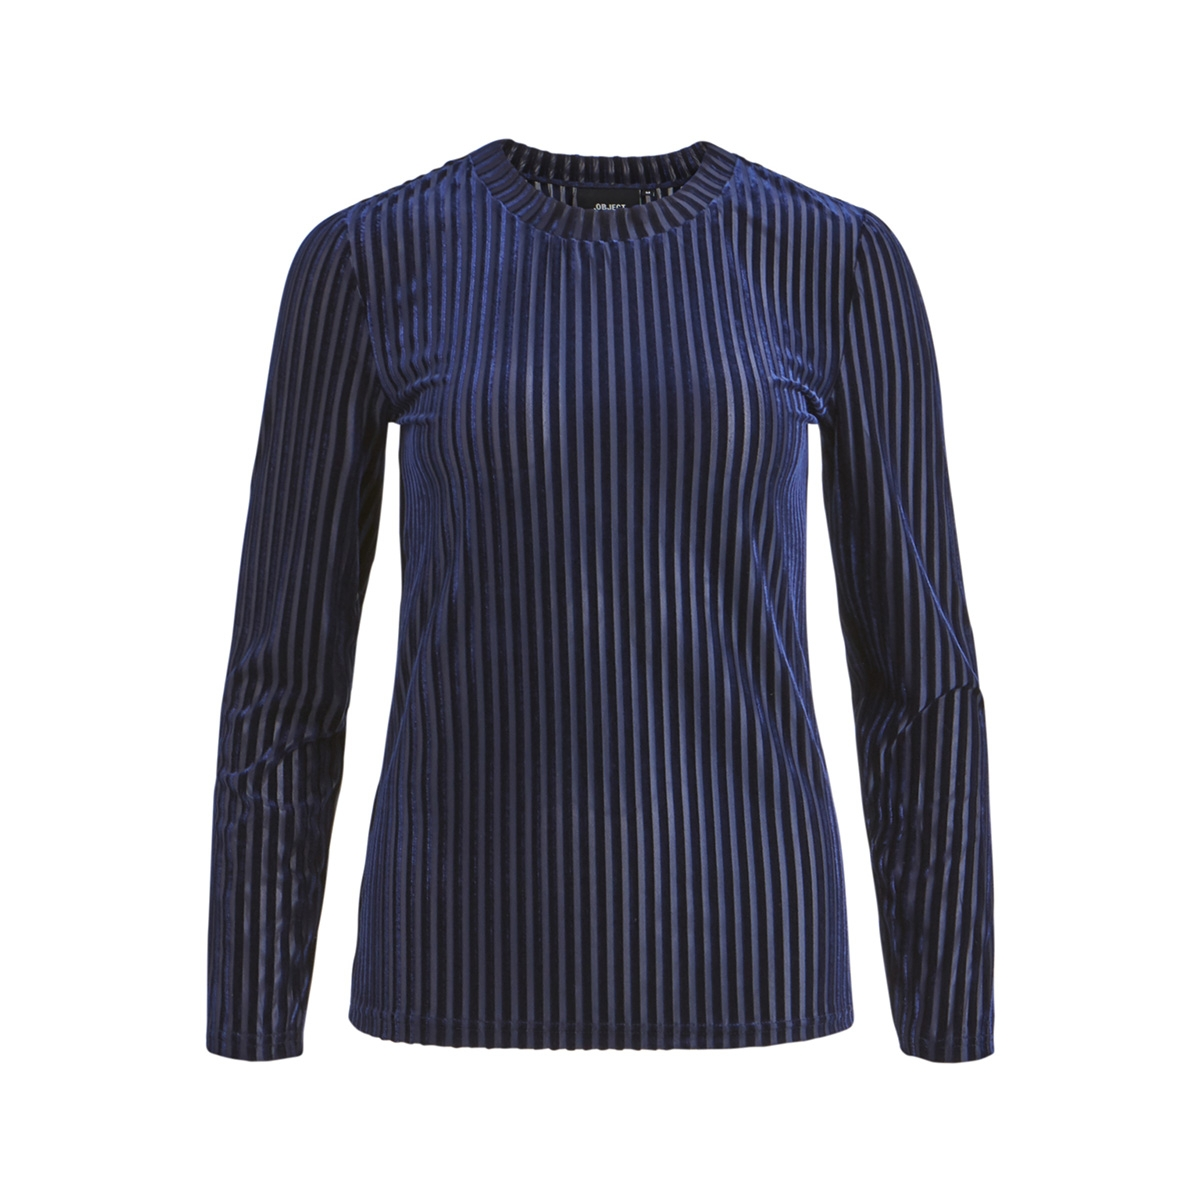 objbelia l/s fitted top a au 23028835 object t-shirt sky captain